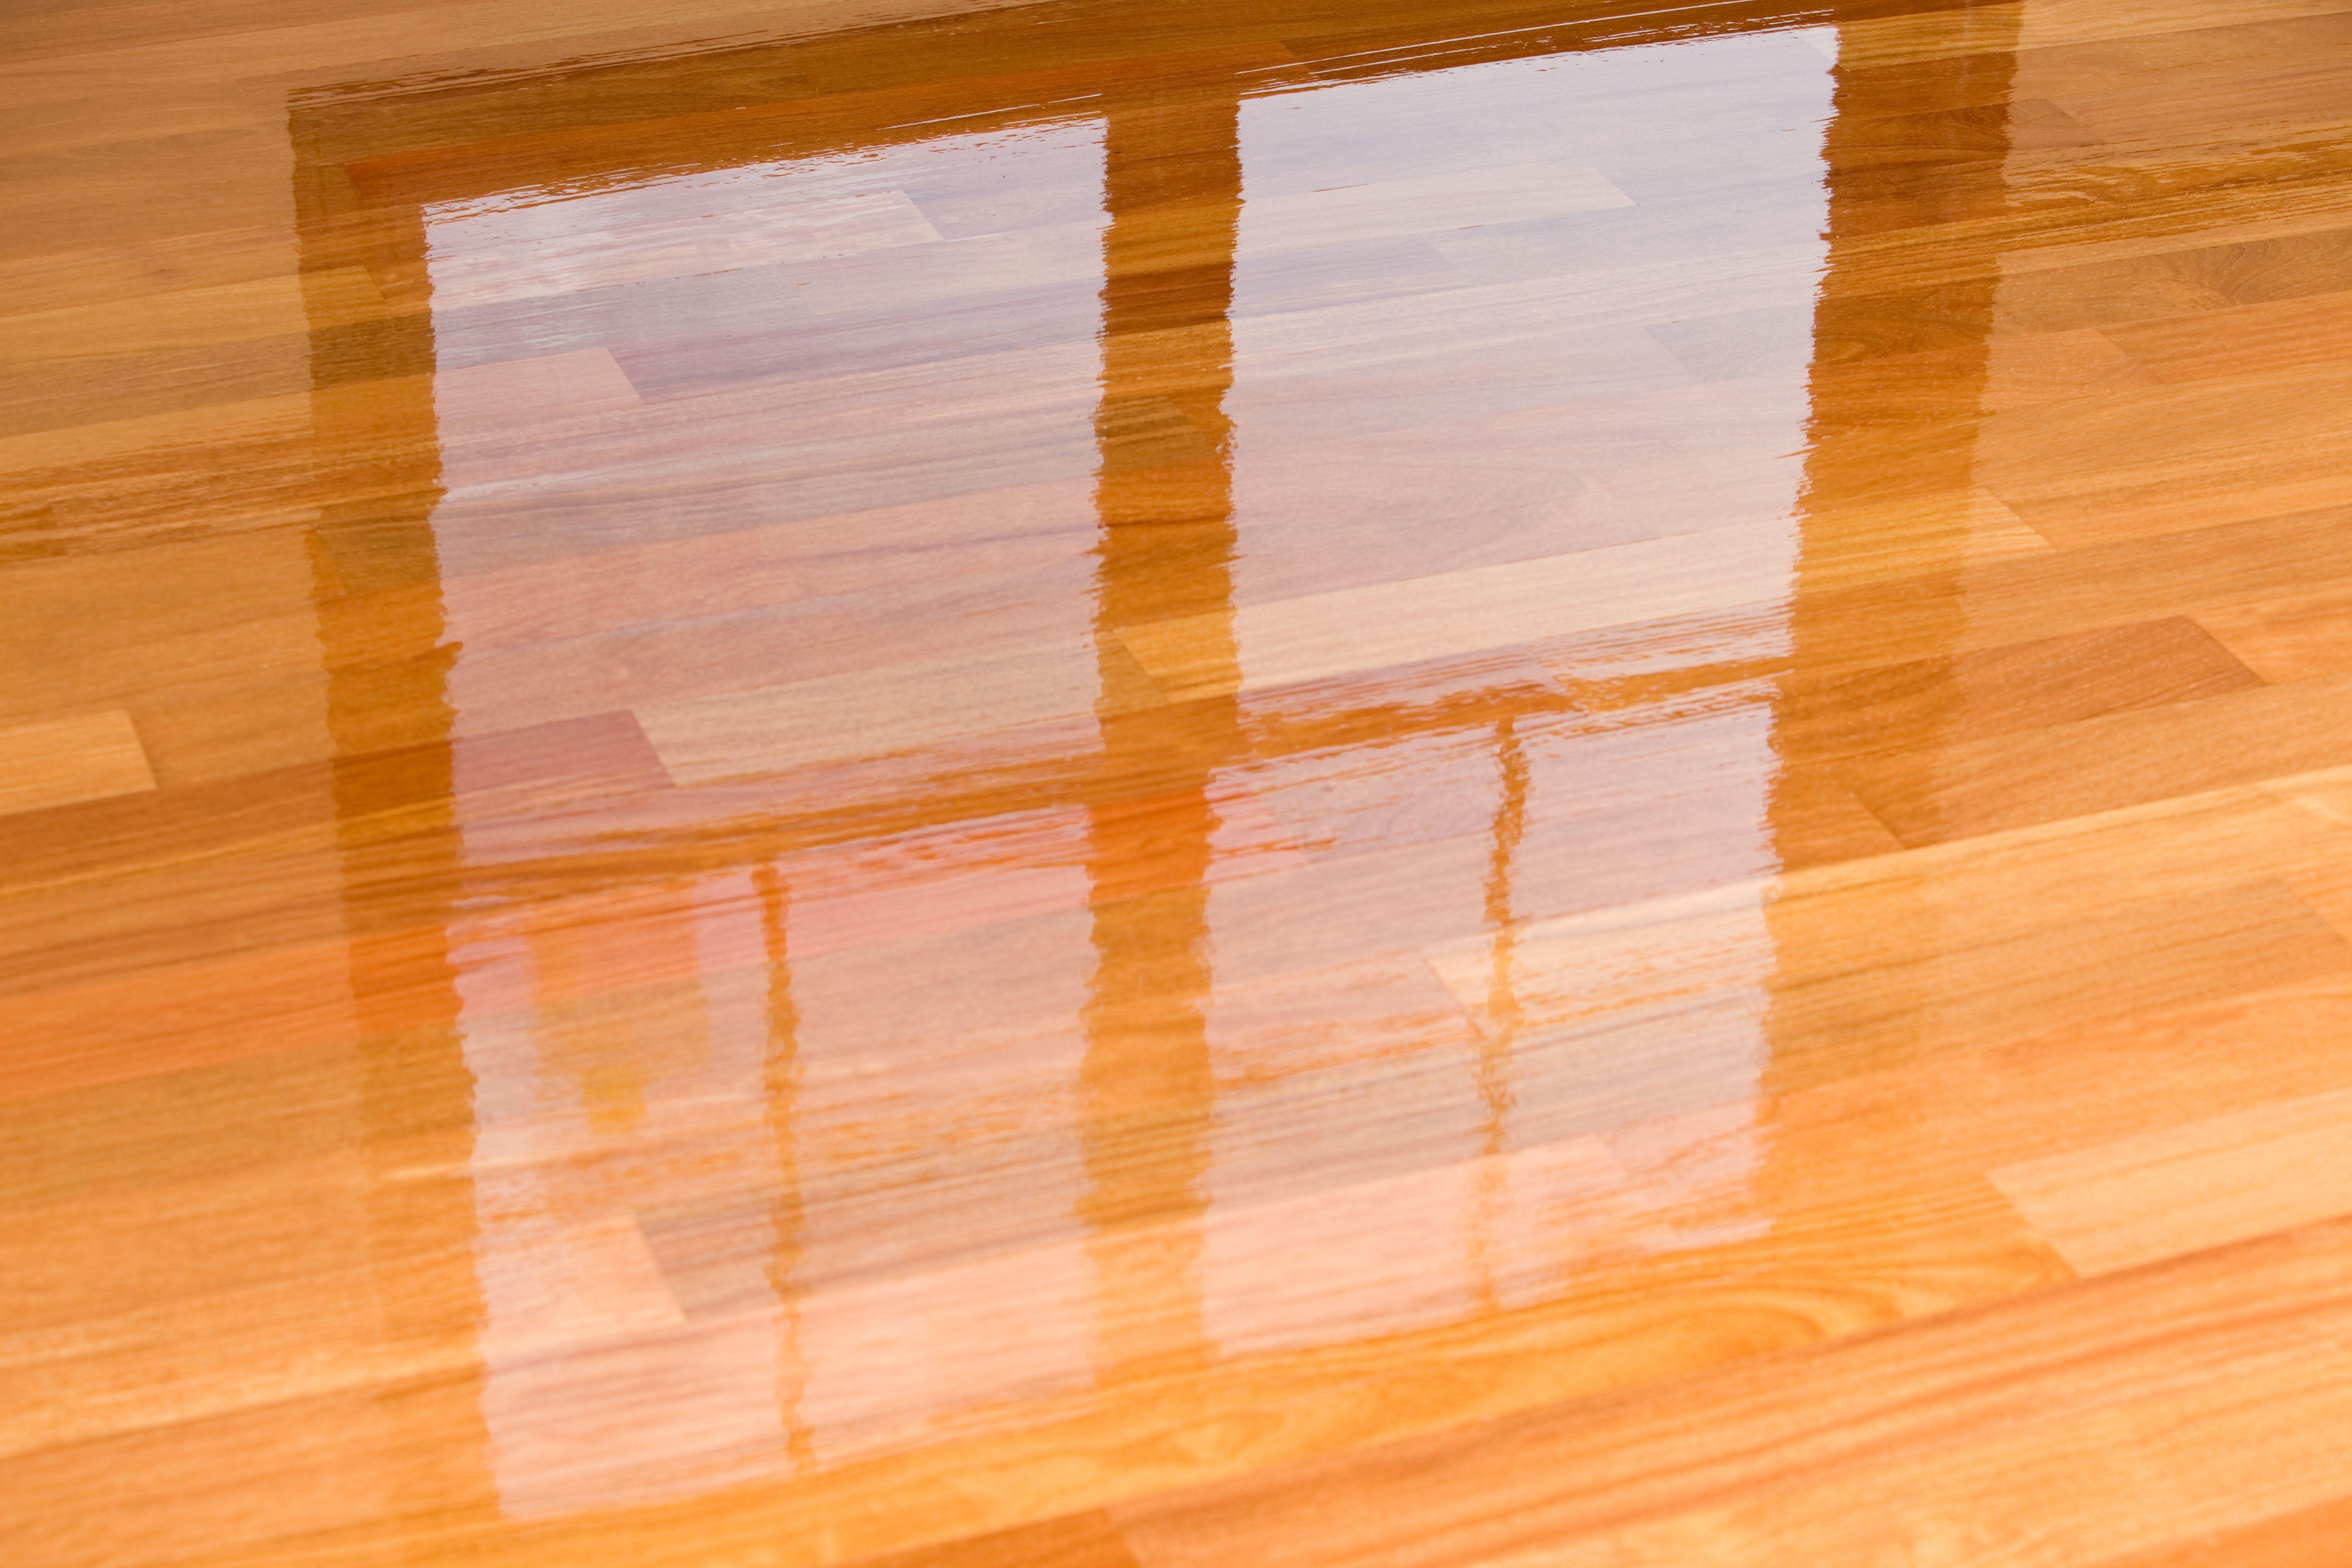 hardwood floor refinishing estimate costs of luxury hardwood floor patterns home design idea for luxury hardwood floor patterns